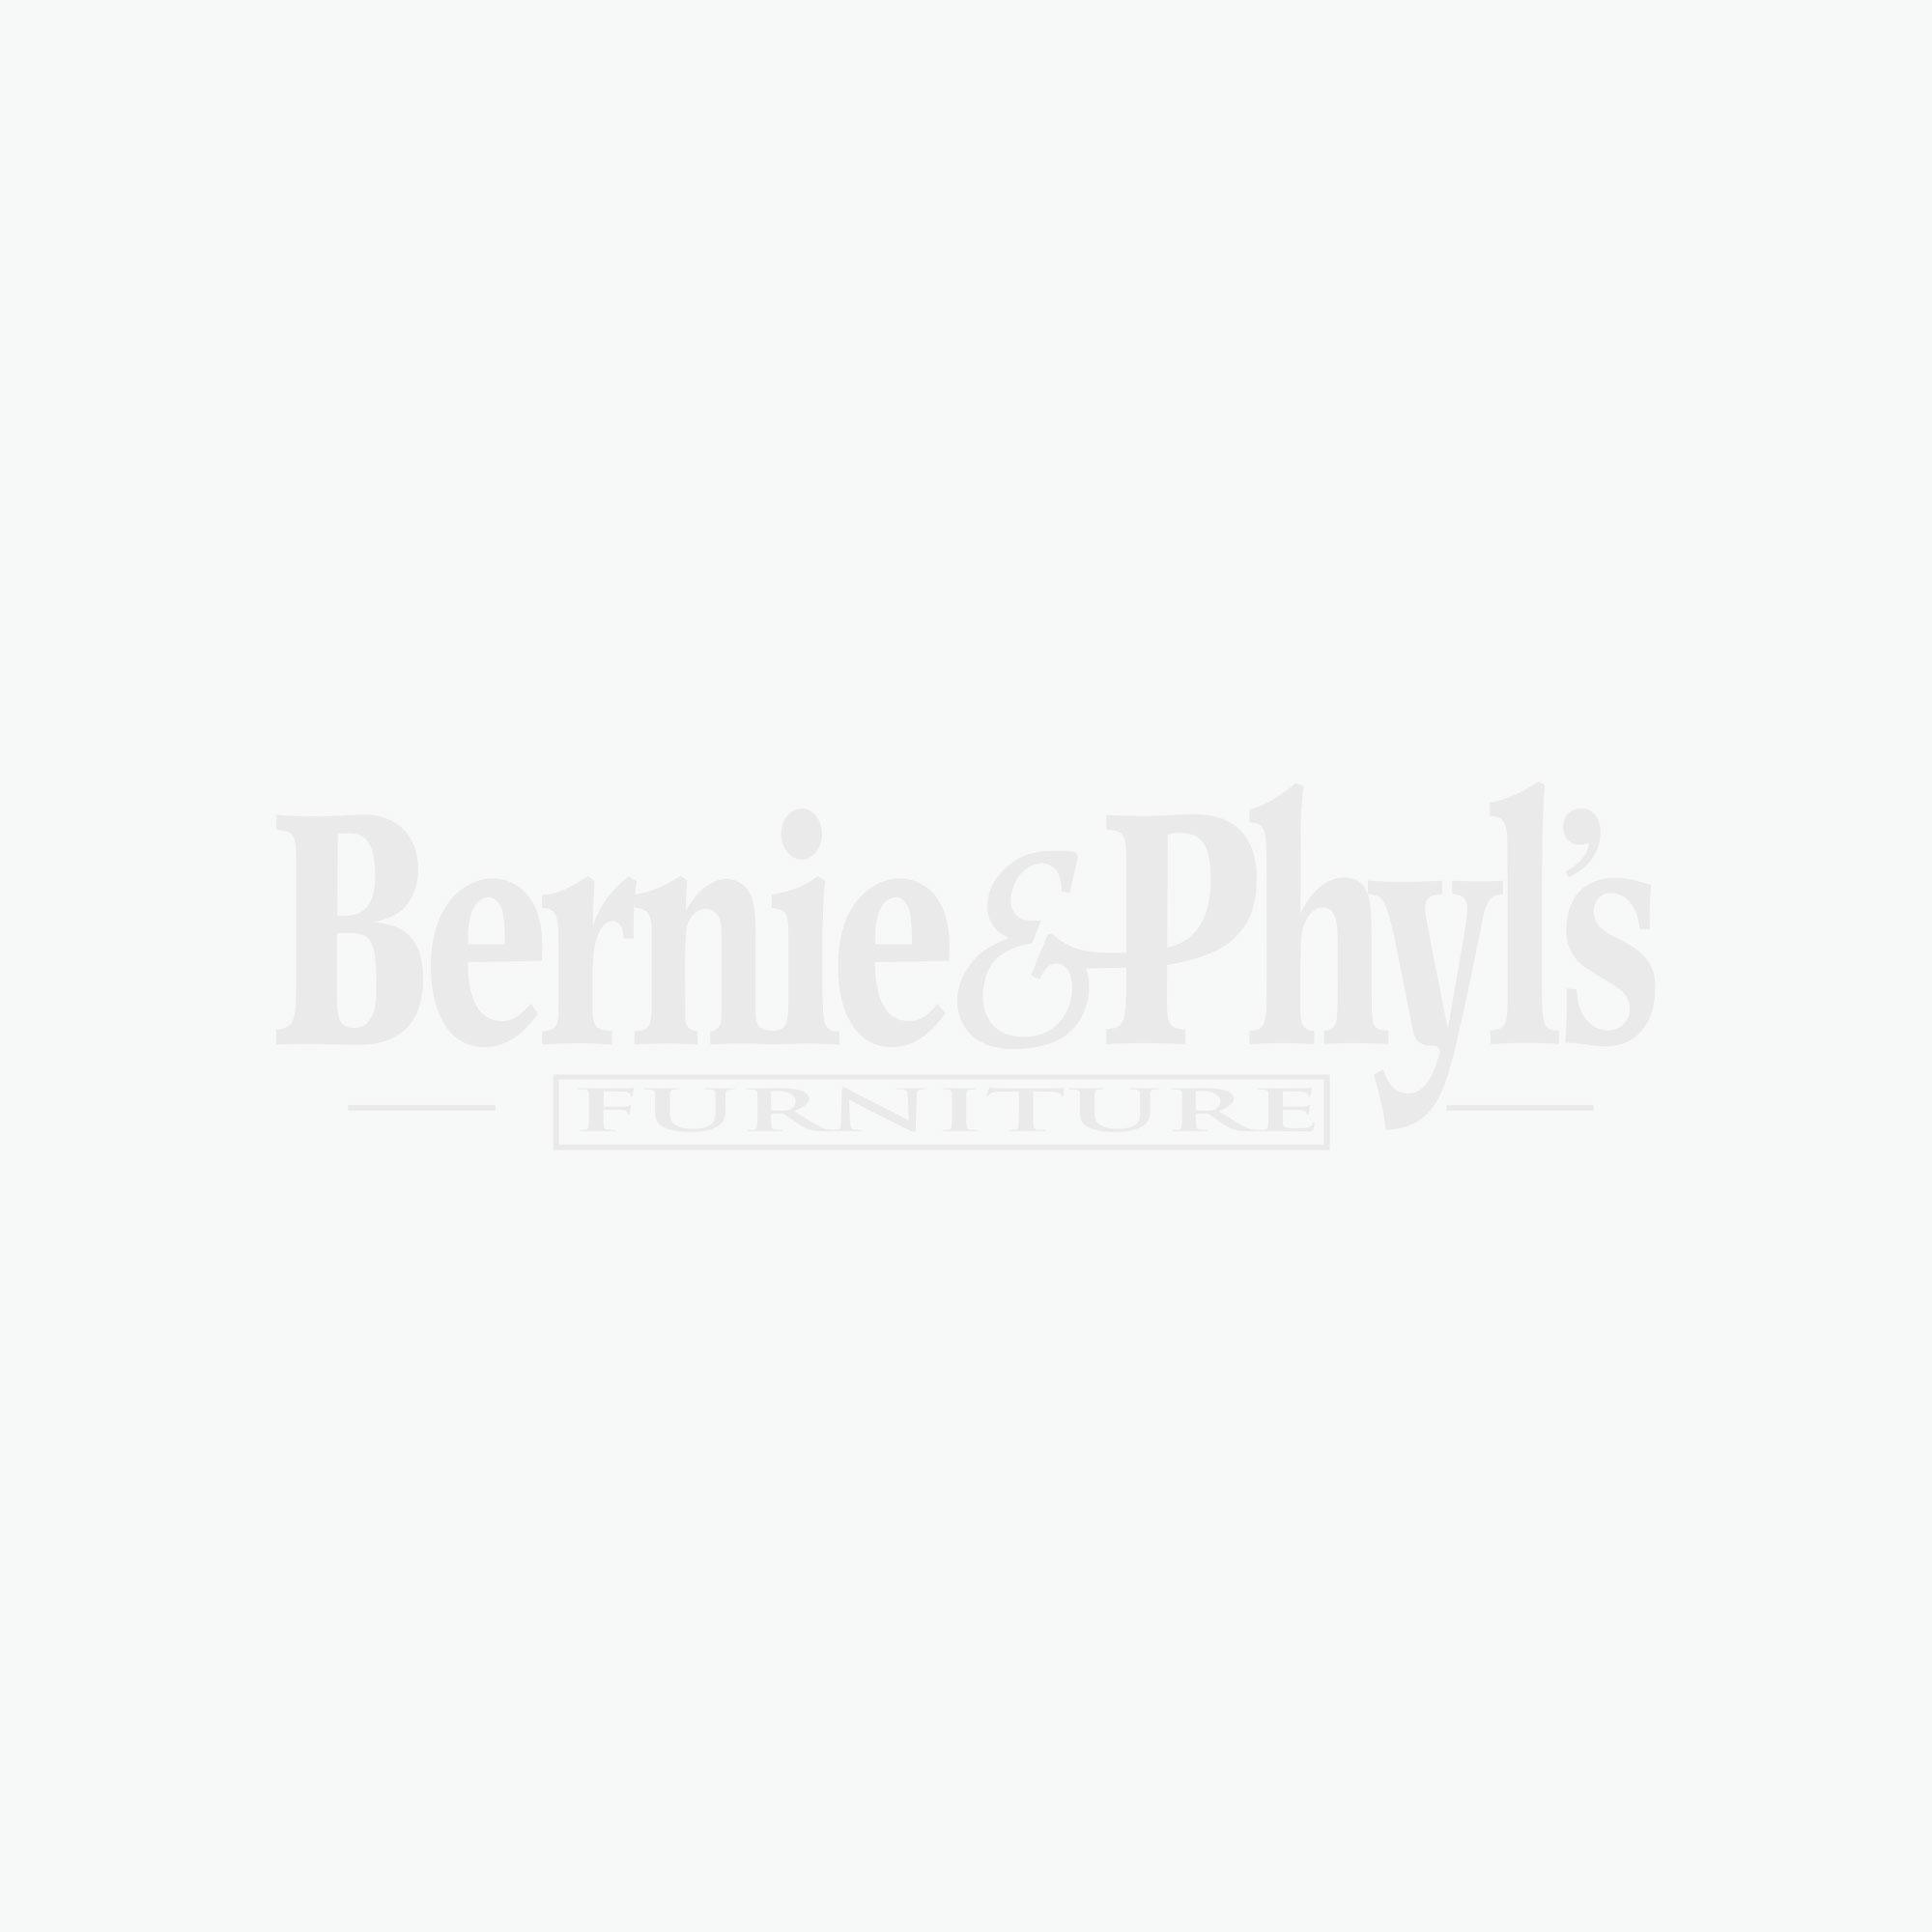 Sealy Posturepedic Copley Square Limited Plush European Top Mattress